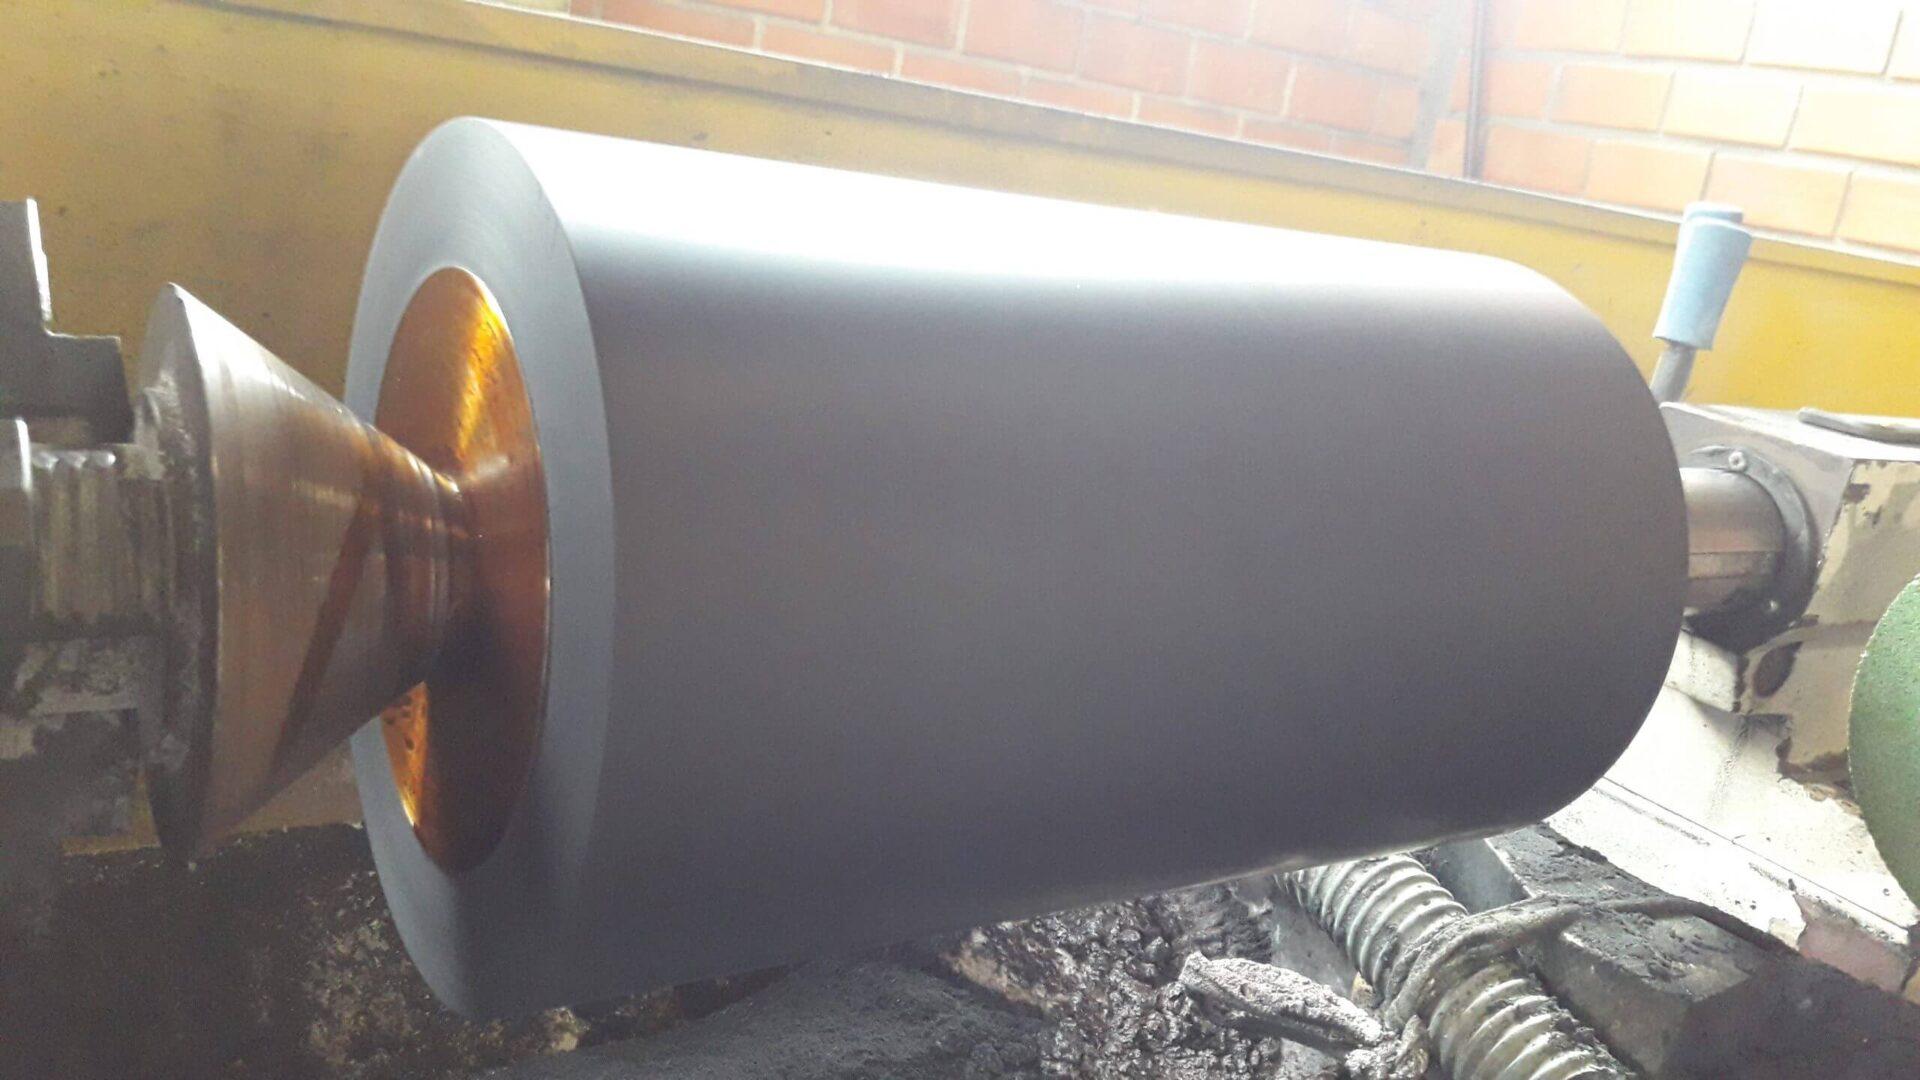 Fabricas de Embalagens -  Revestimento de Cilindro de Borracha